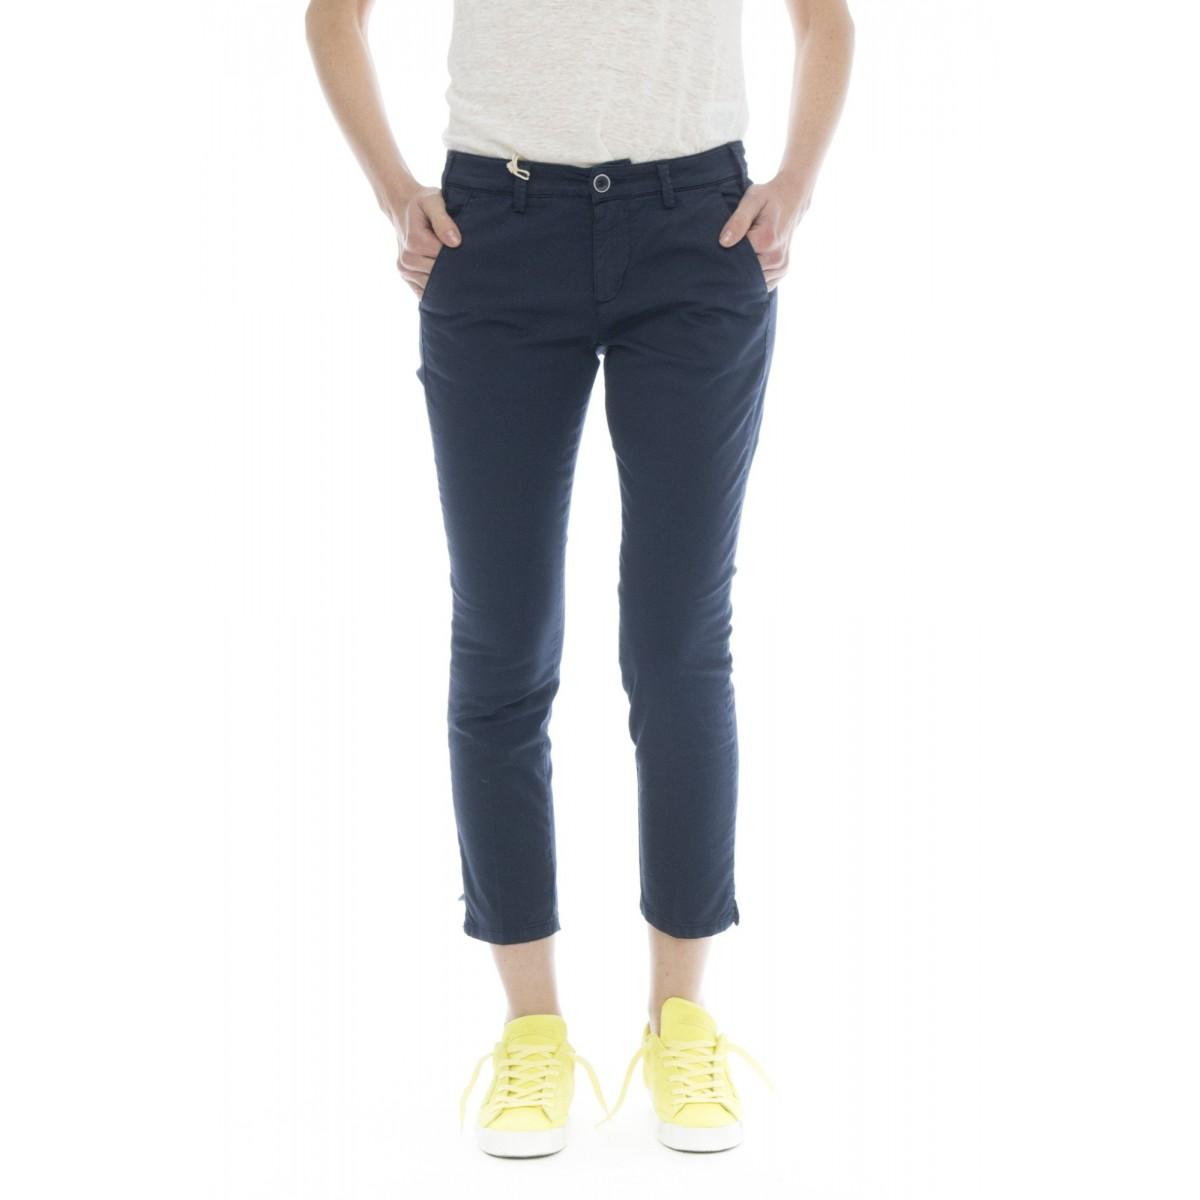 Pantalone donna - Melitas 1165 super slim strech caviglia